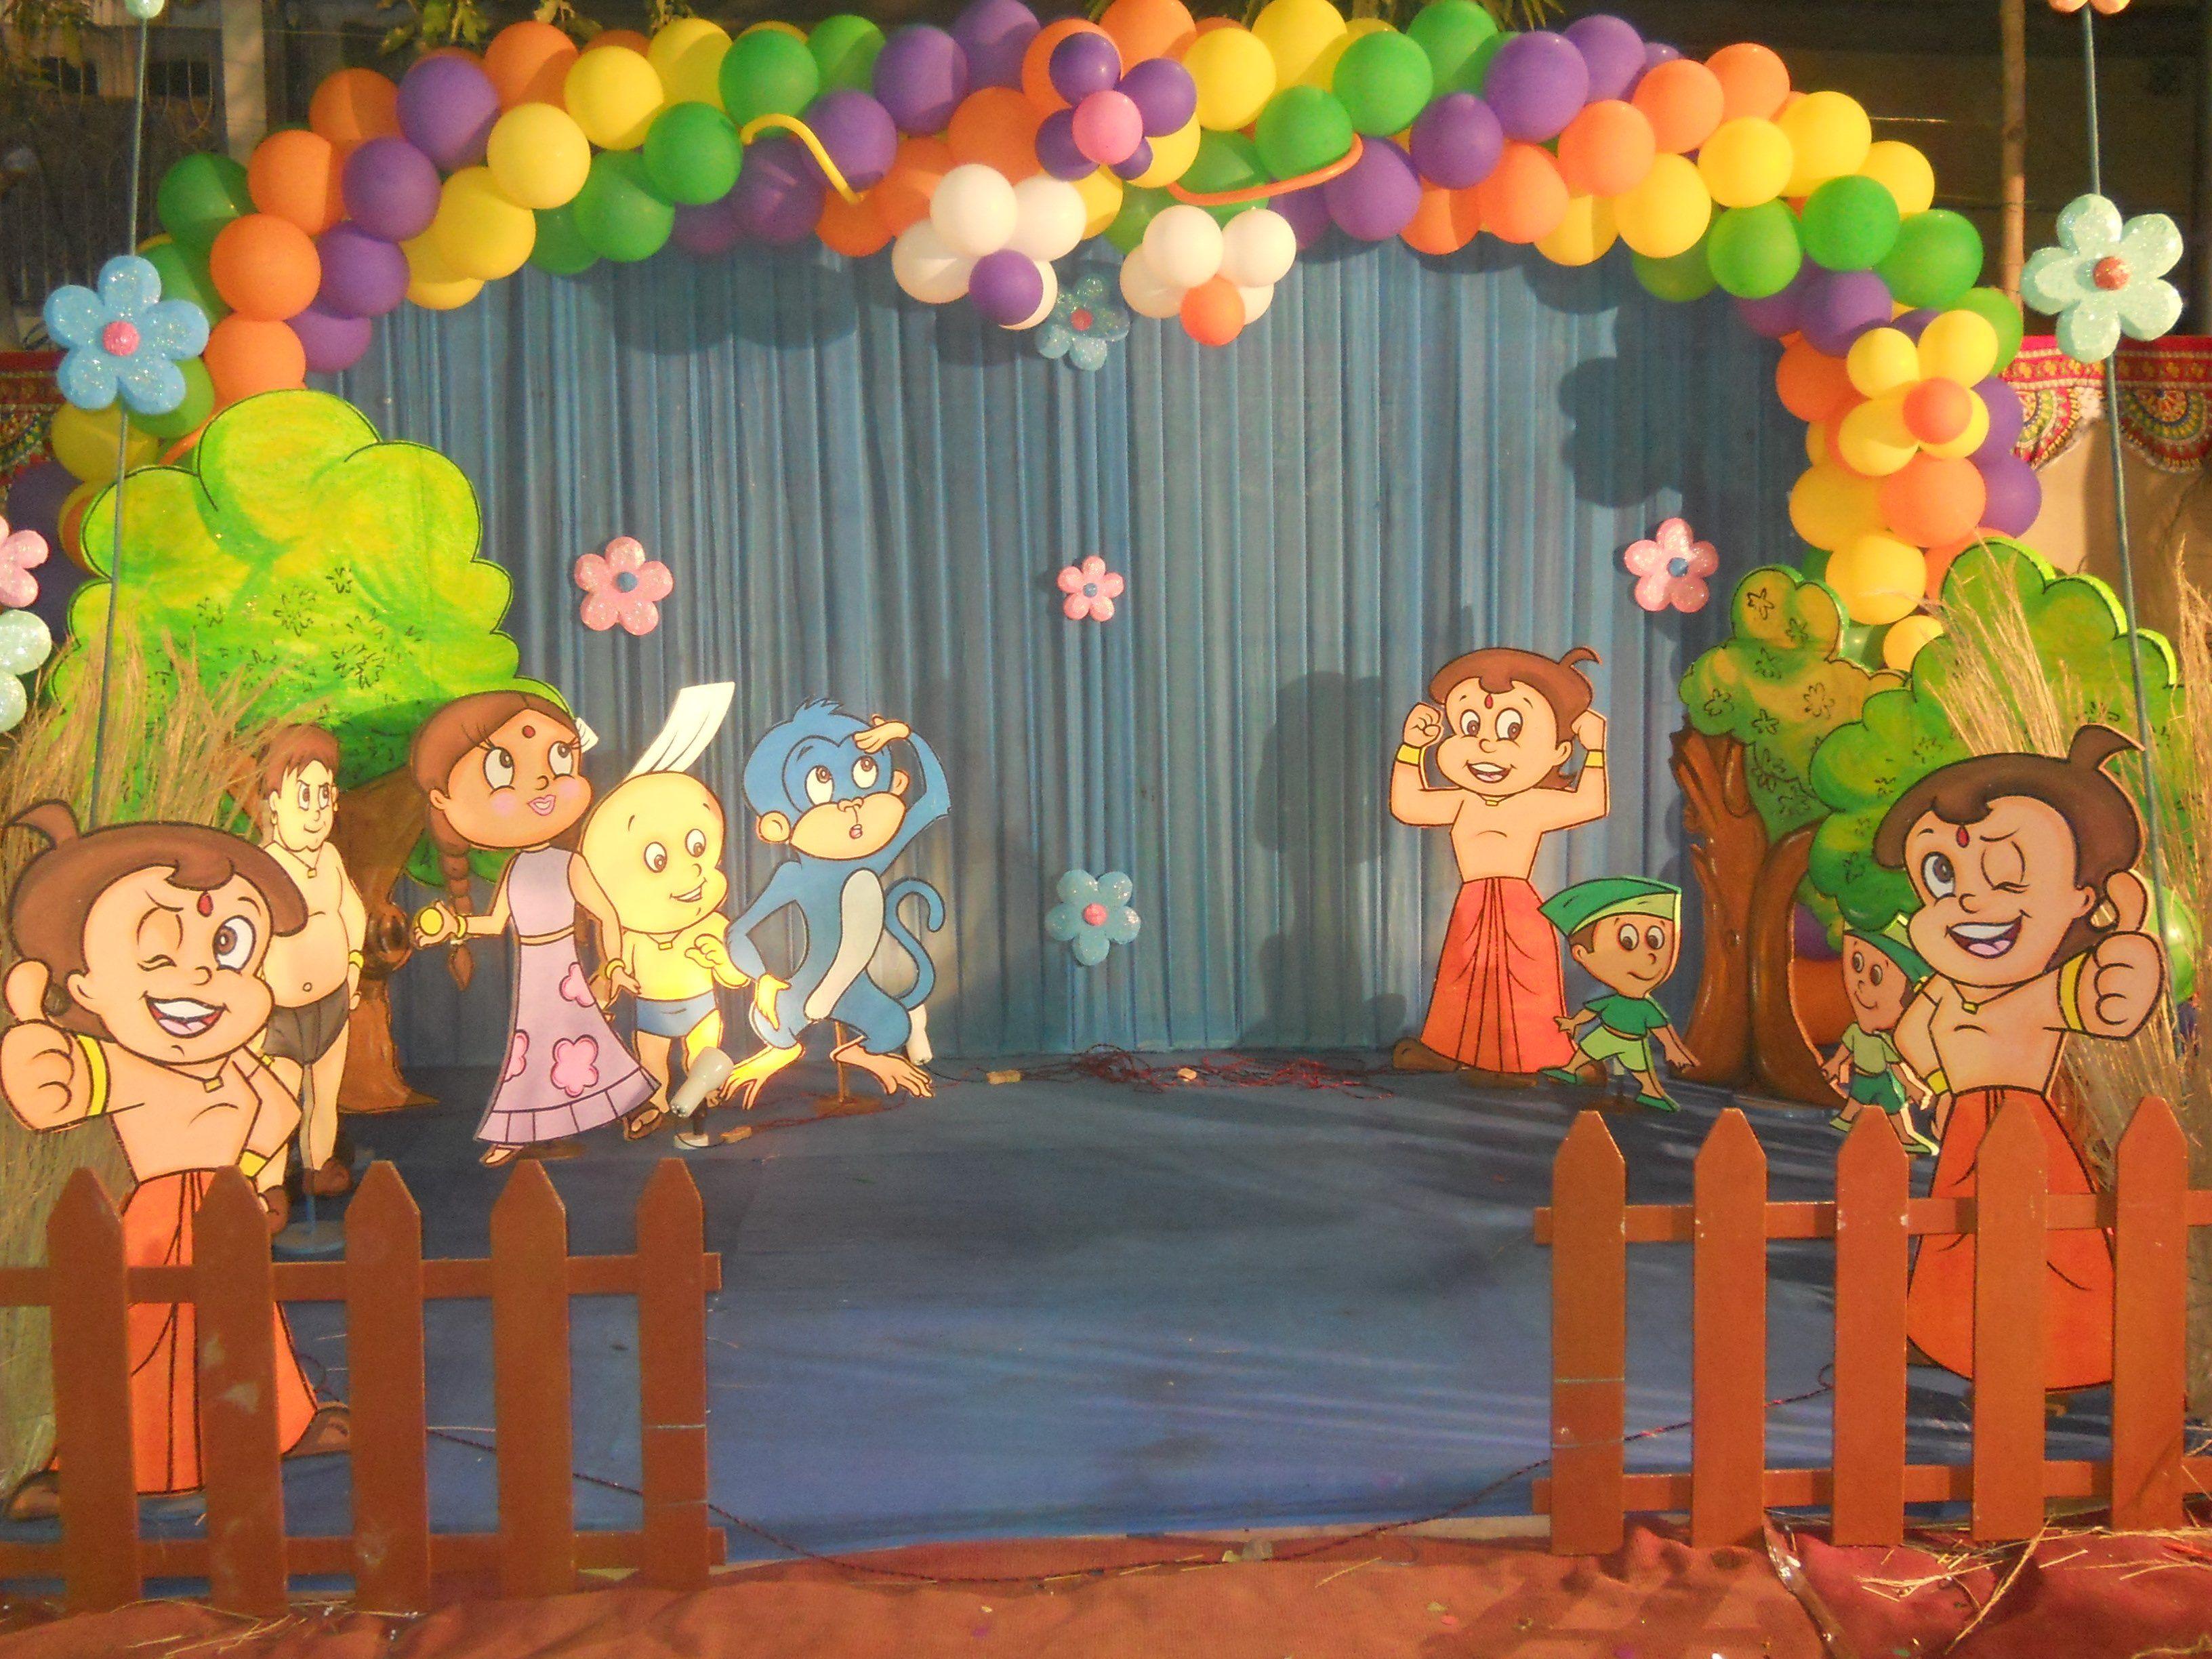 Chhota Bheem Theme 4 Stars Most Beautiful Birthday Party Themes